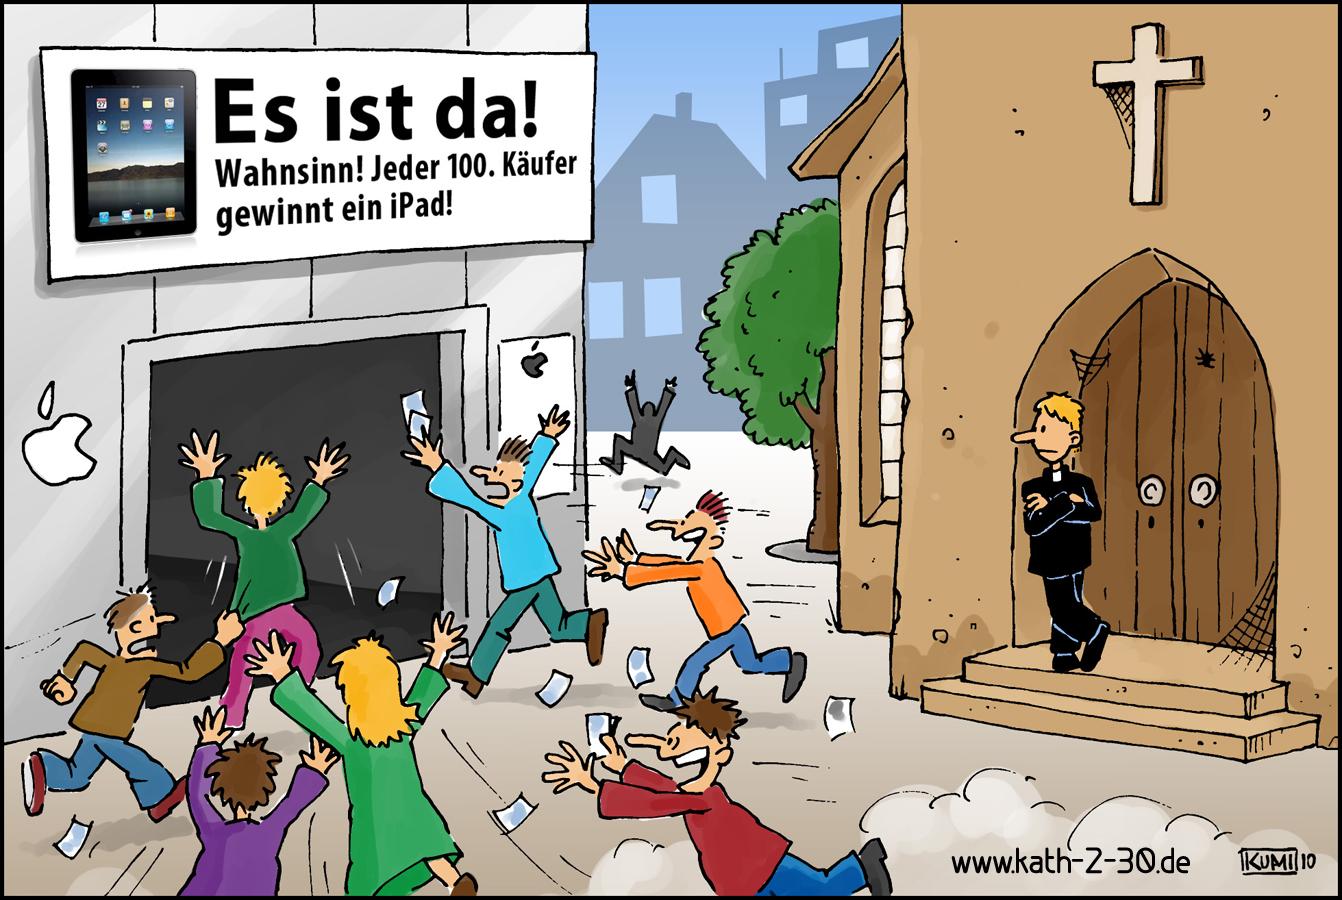 http://www.kath-2-30.de/wp-content/uploads/2010/05/iPad_1300x900.jpg